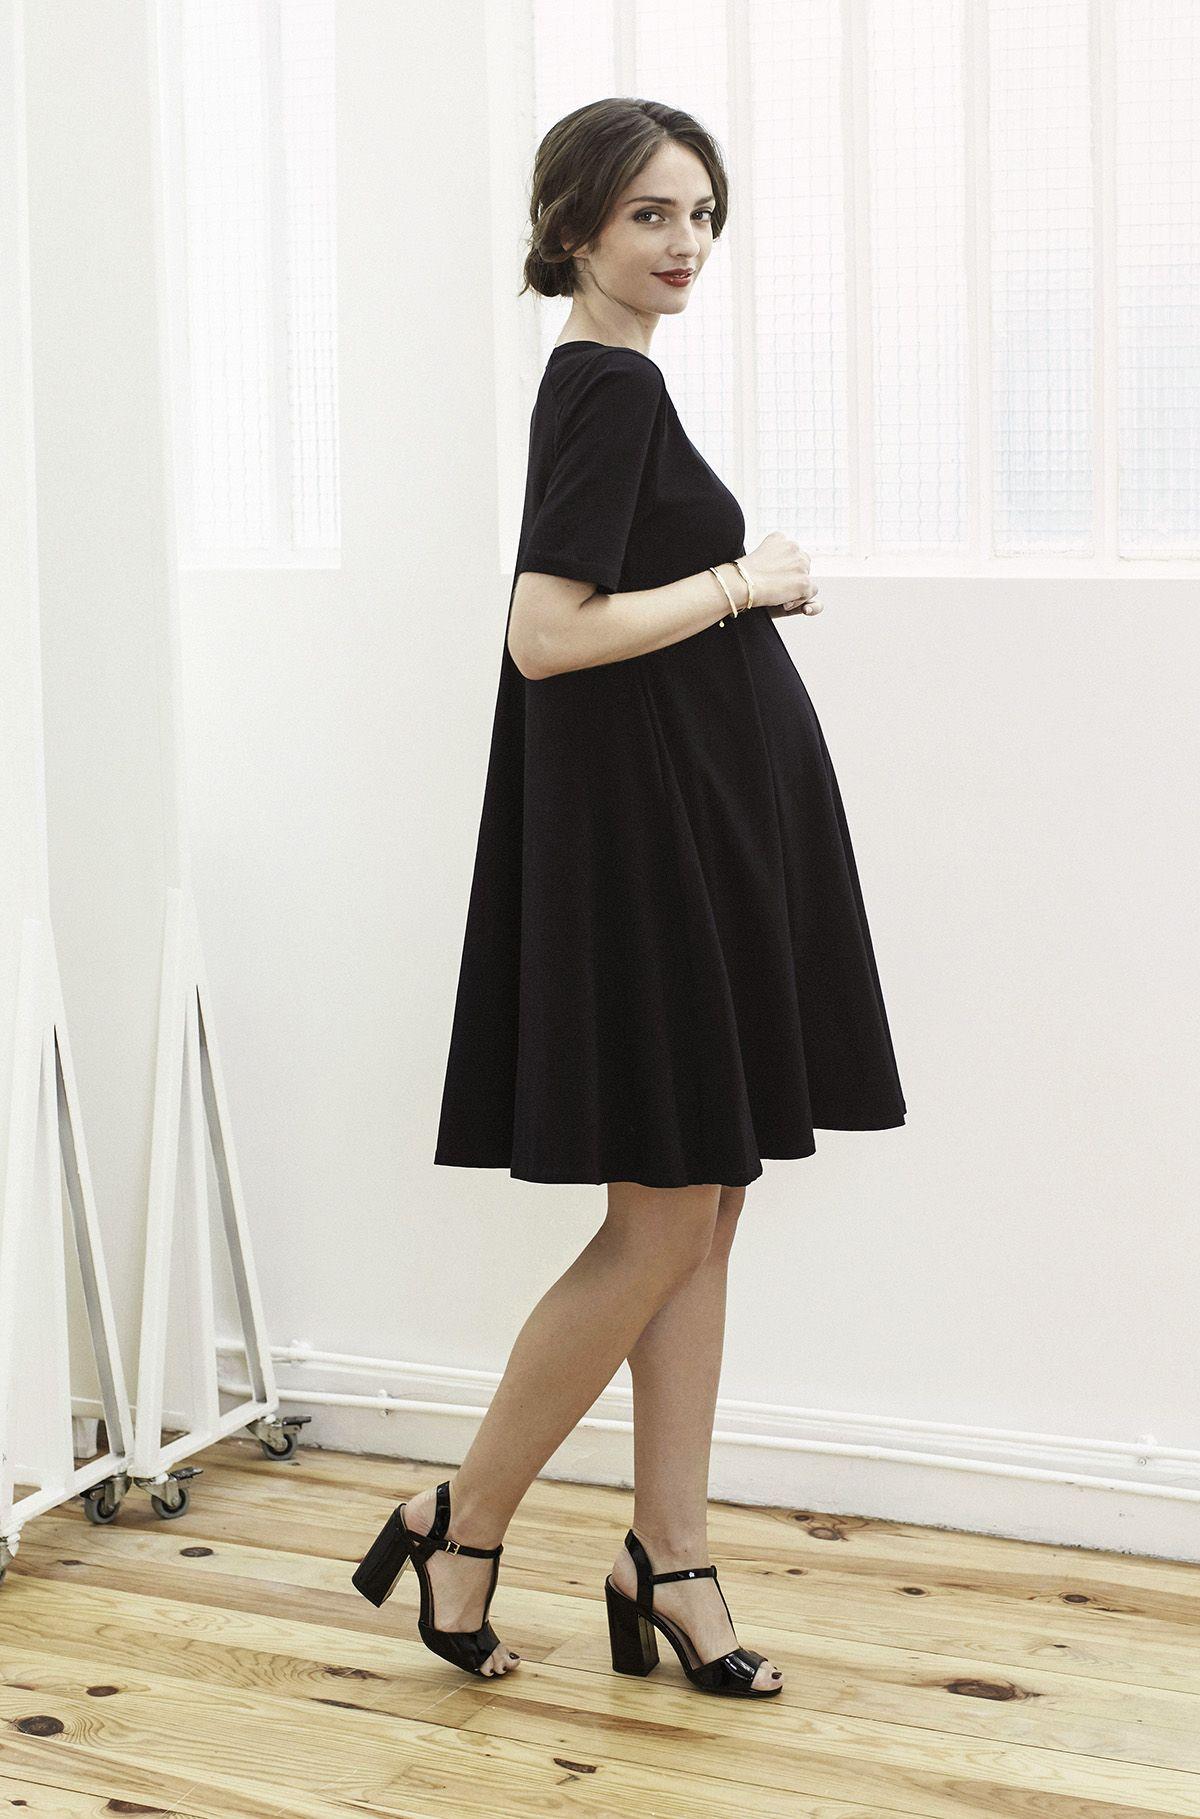 La petite robe noire en ucuz